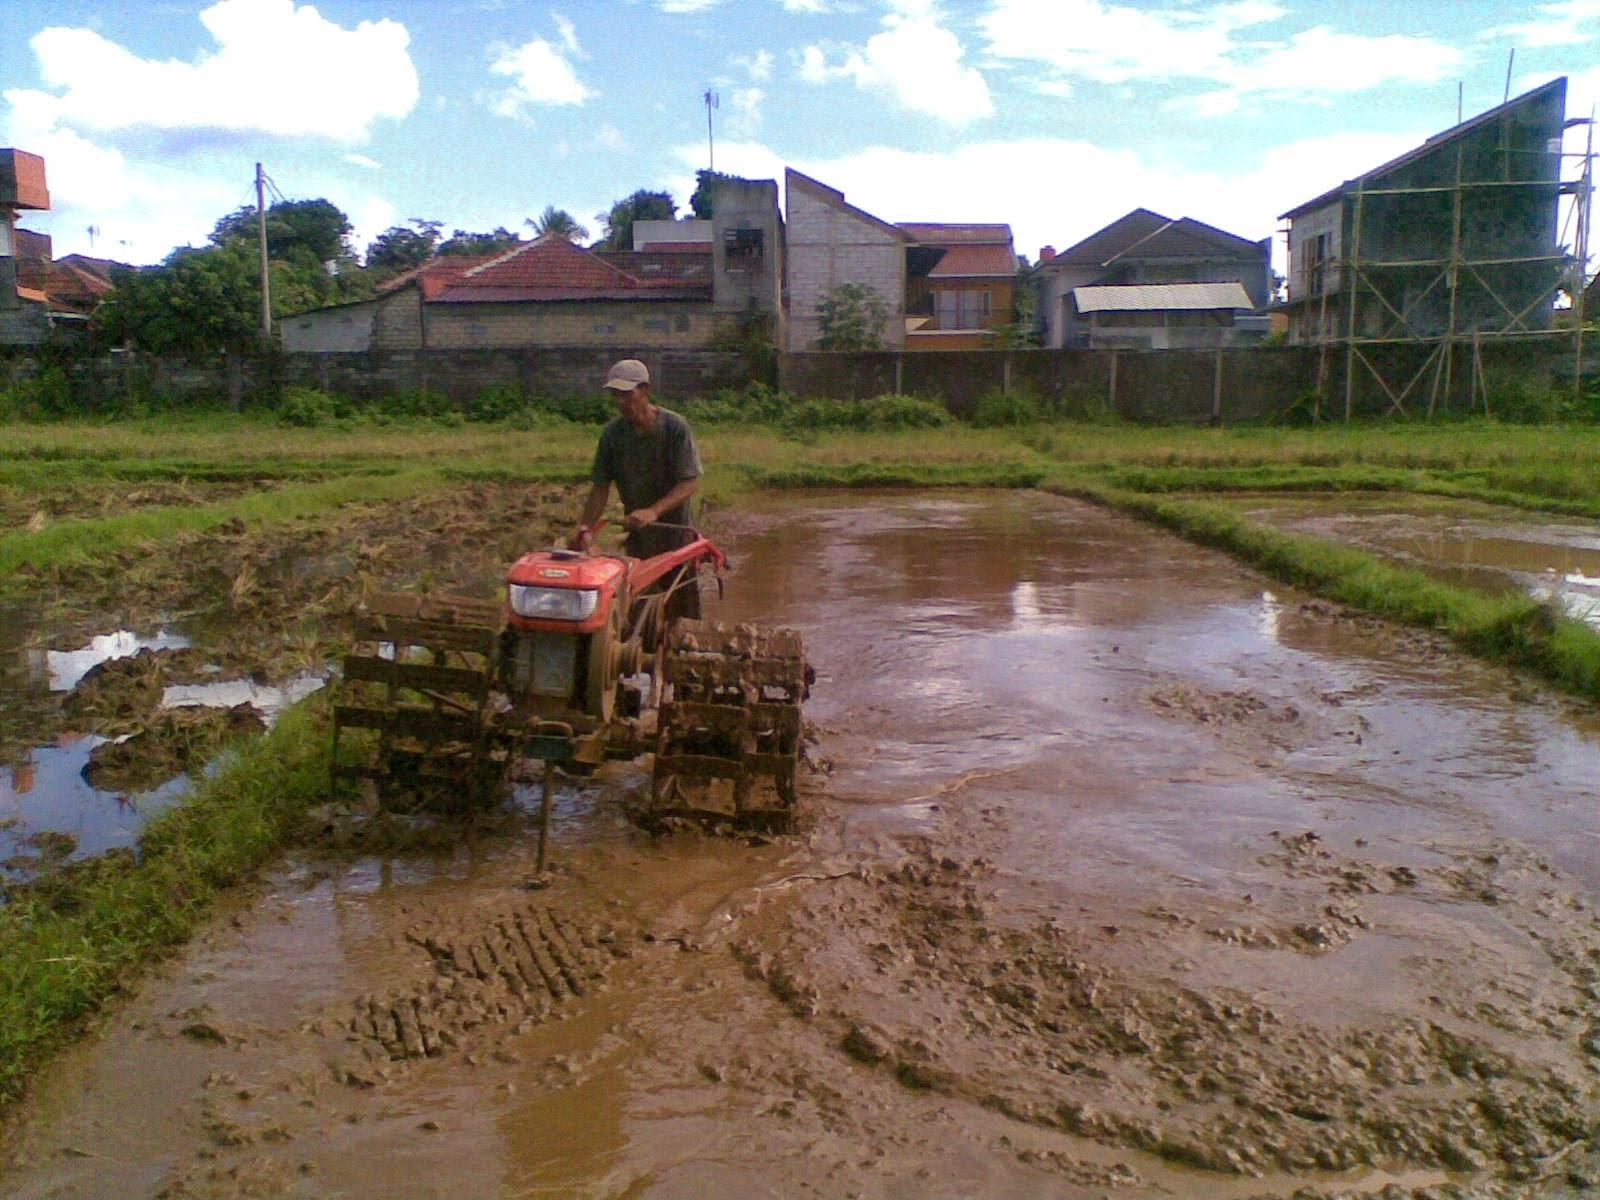 Pengolahan lahan, traktor roda dua, sawah